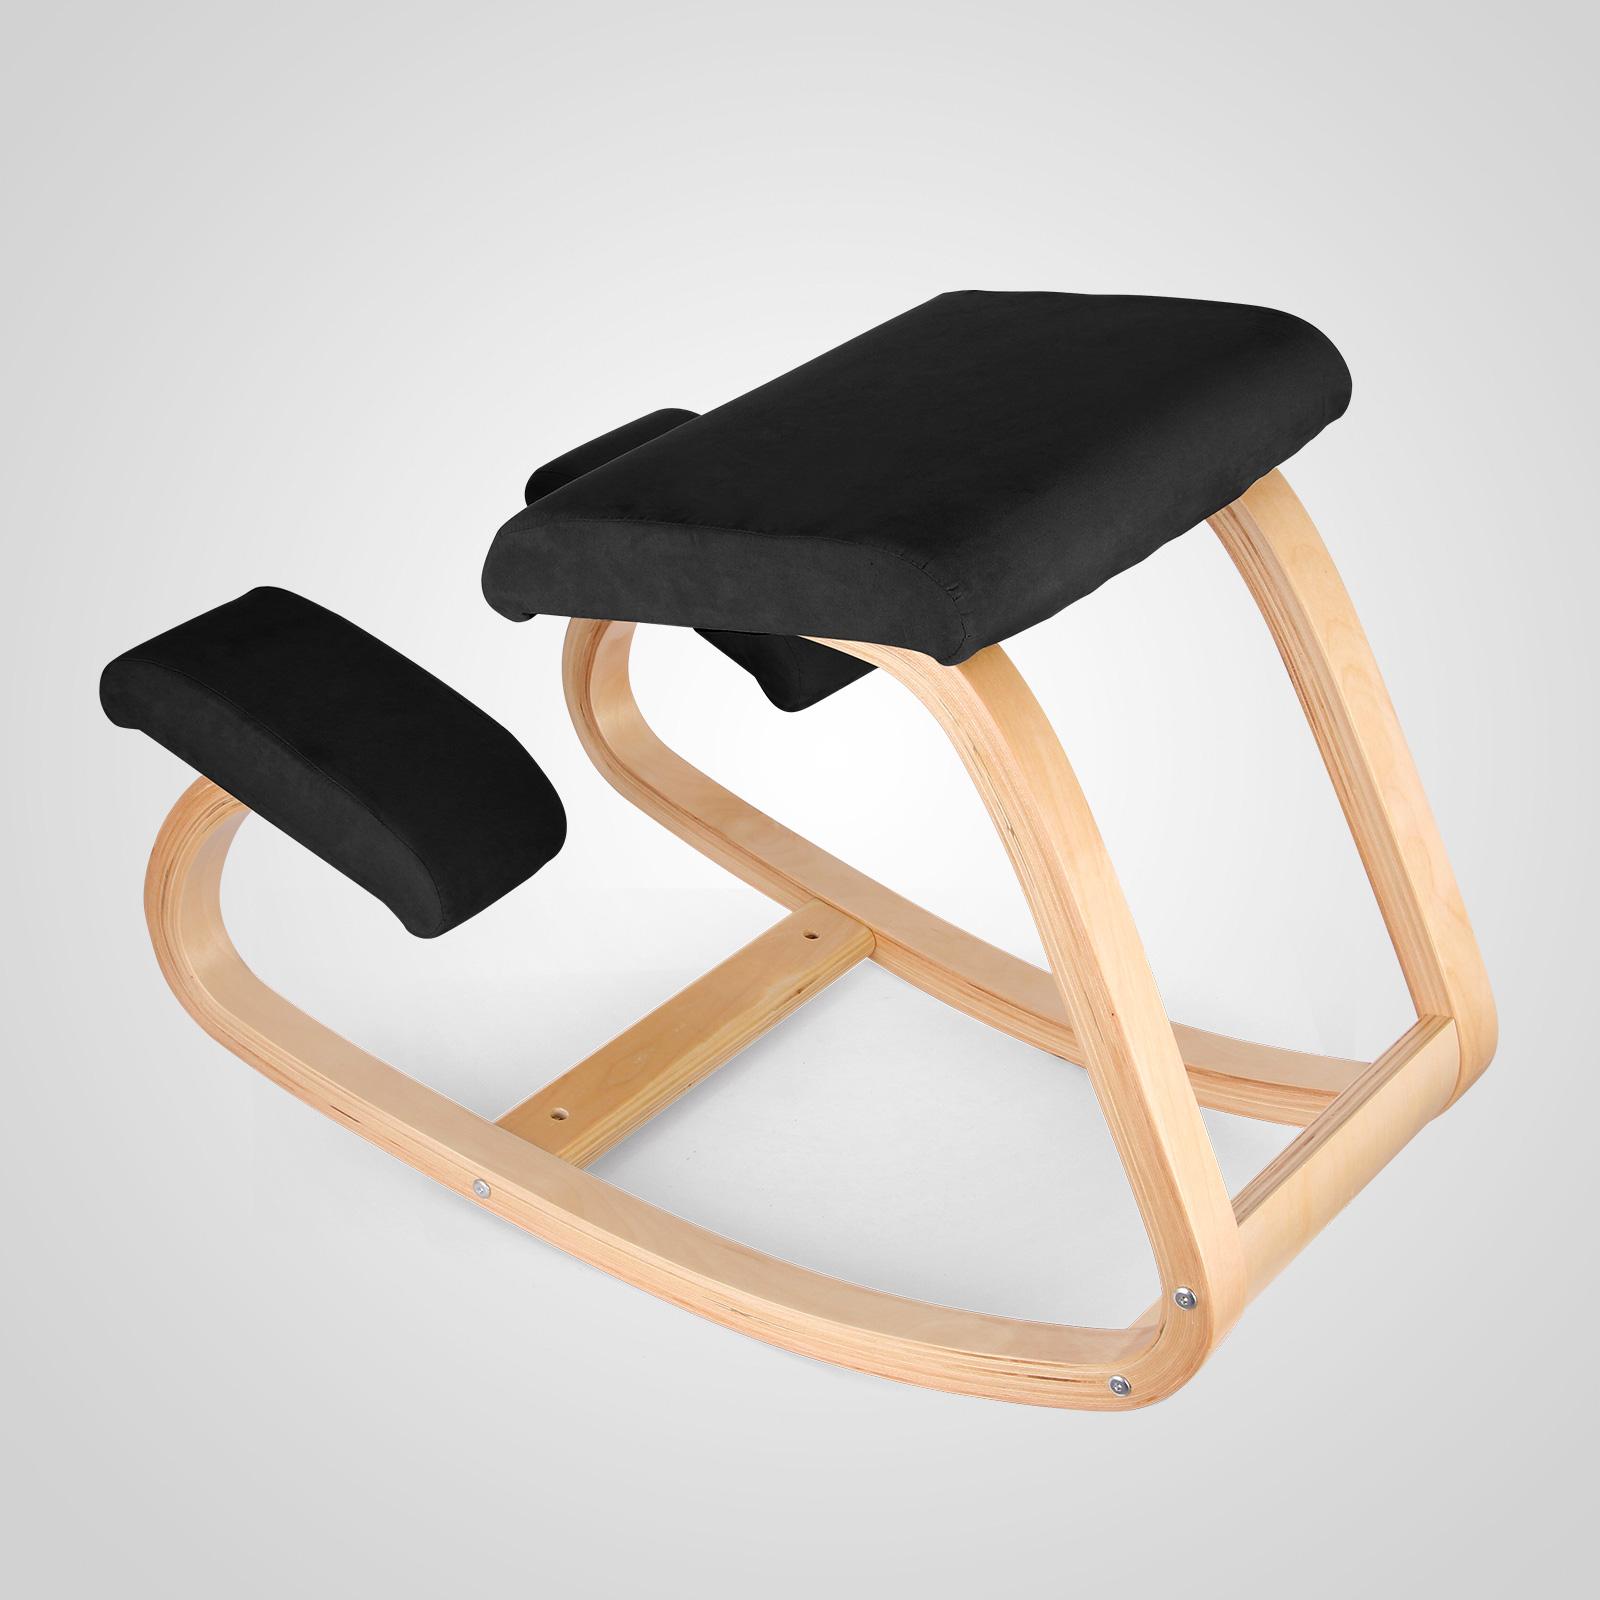 Ergonomic Kneeling Chair Rocking Chair Knee Stool For Home